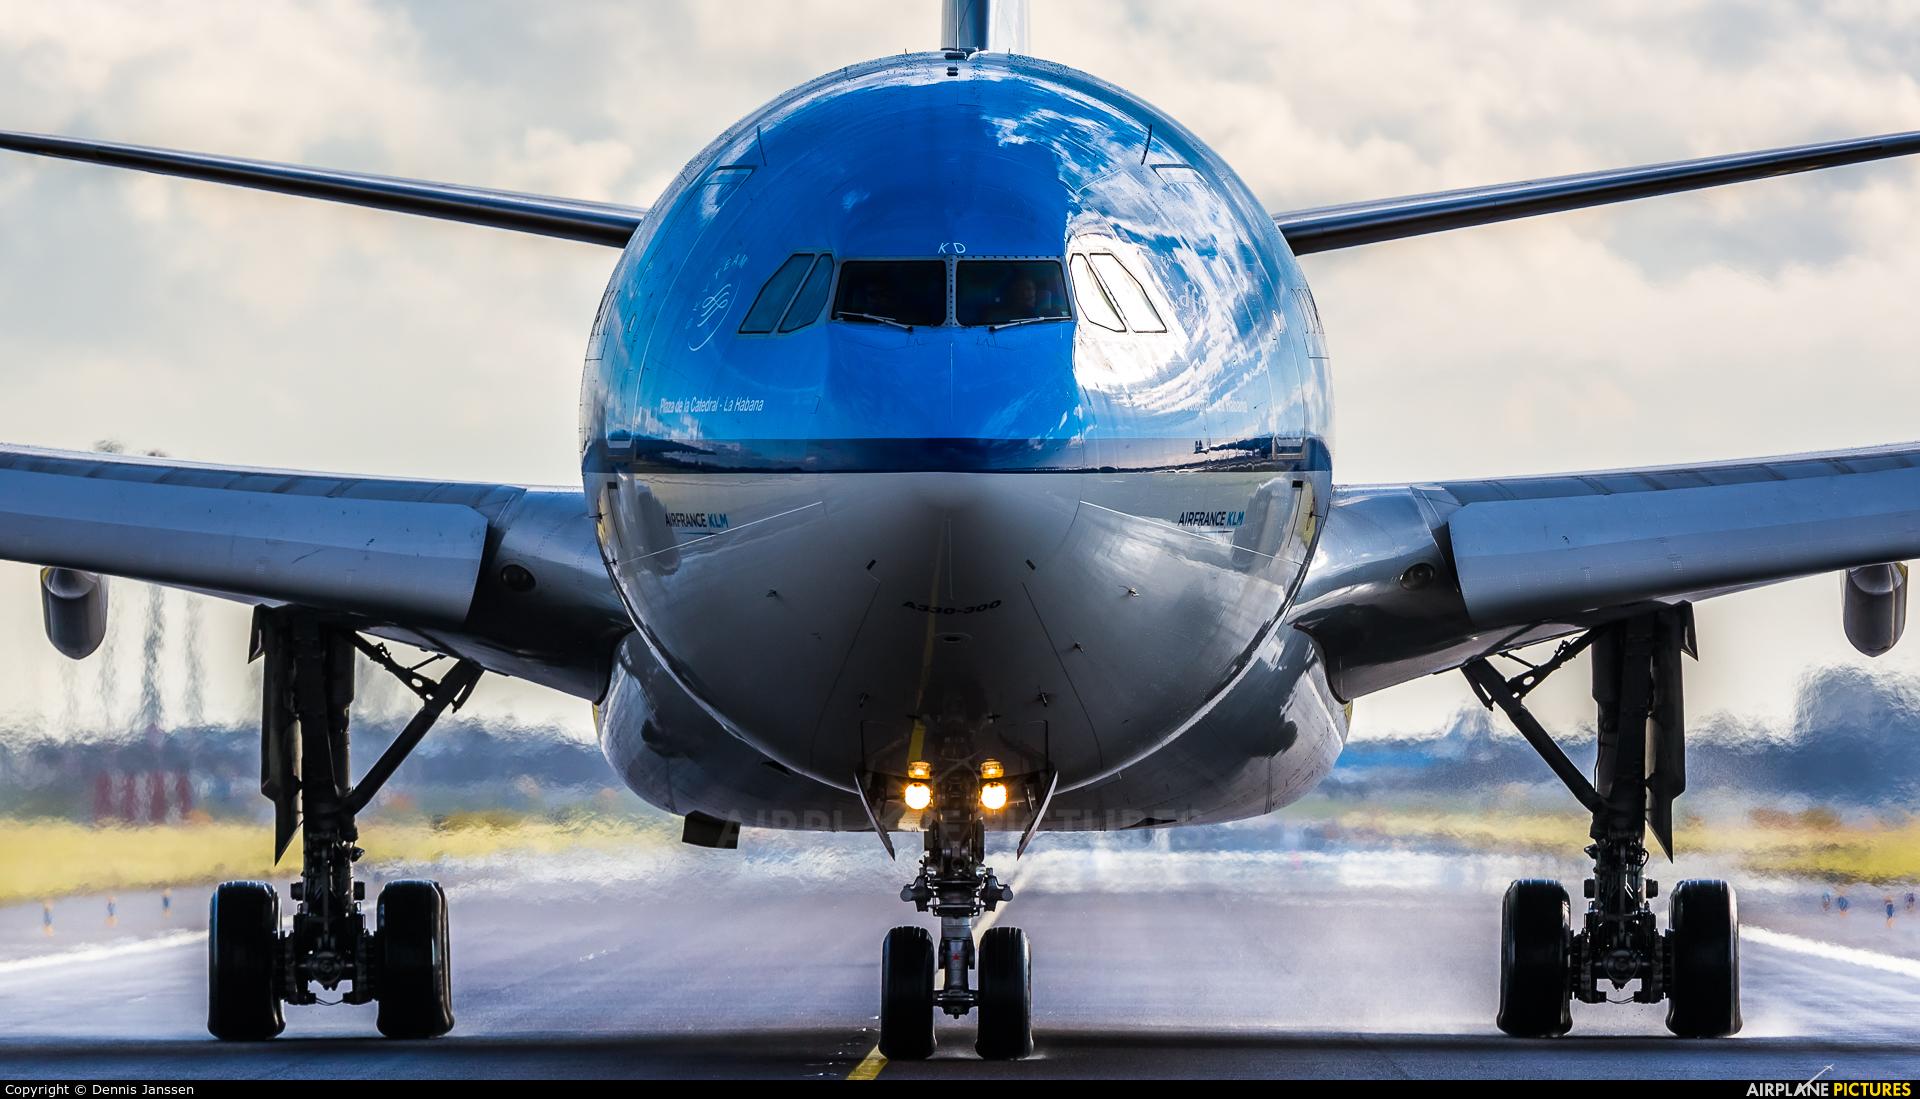 KLM PH-AKD aircraft at Amsterdam - Schiphol